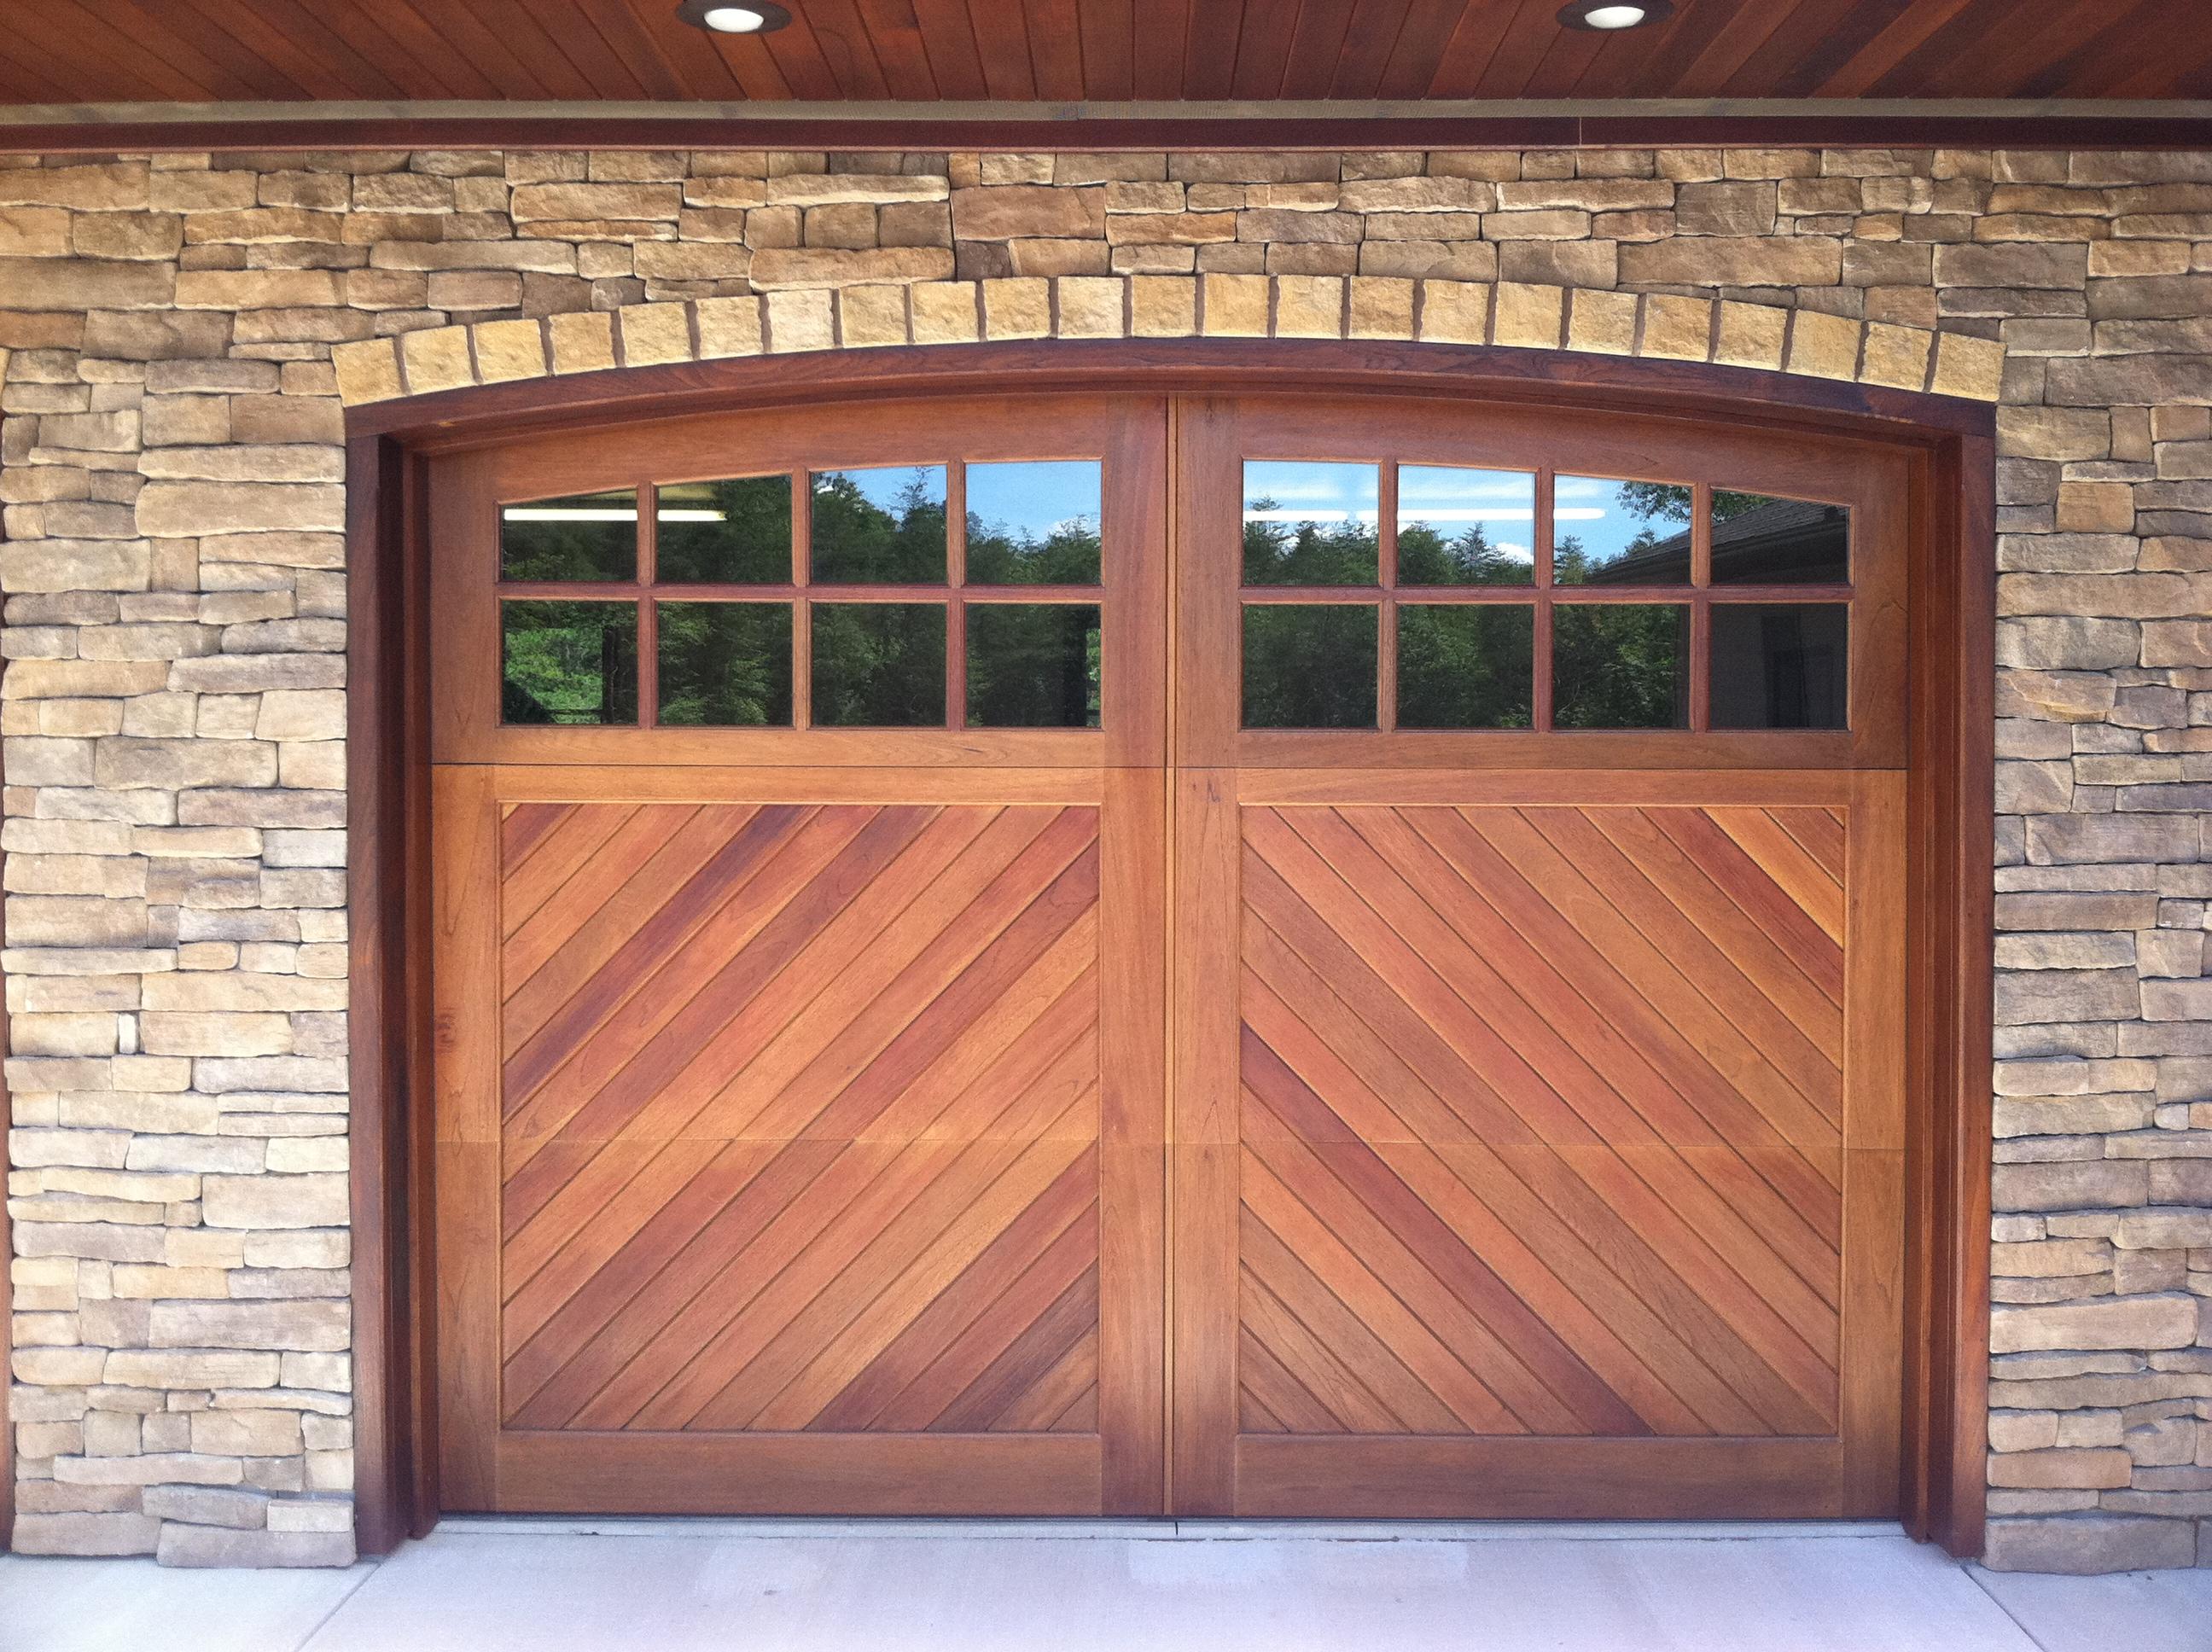 Wood Garage Doors and Carriage Doors - Clearville, Pennsylvania